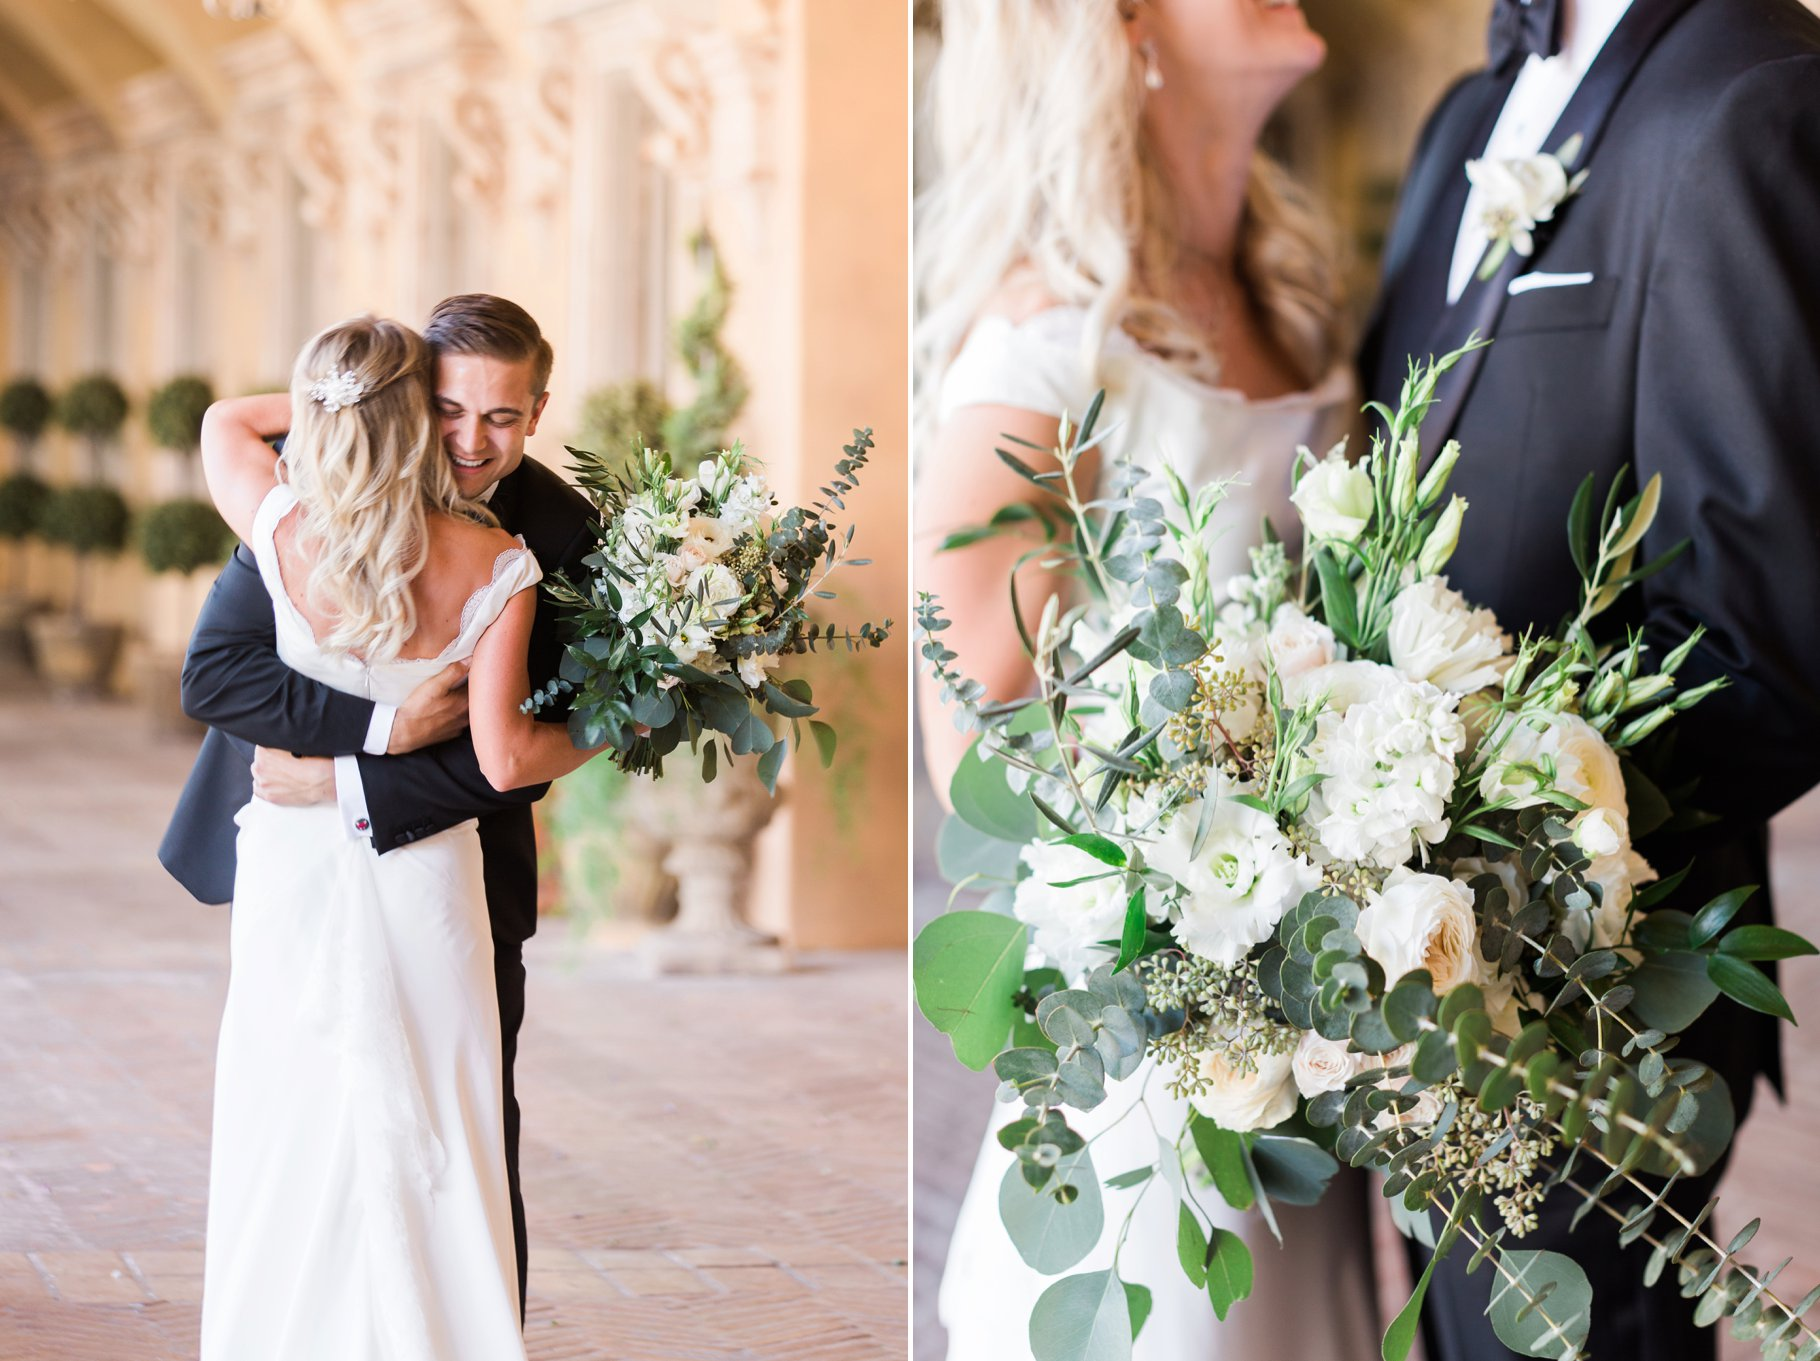 villa siena wedding-025_GRETCHEN WAKEMAN PHOTOGRAPHY.jpg